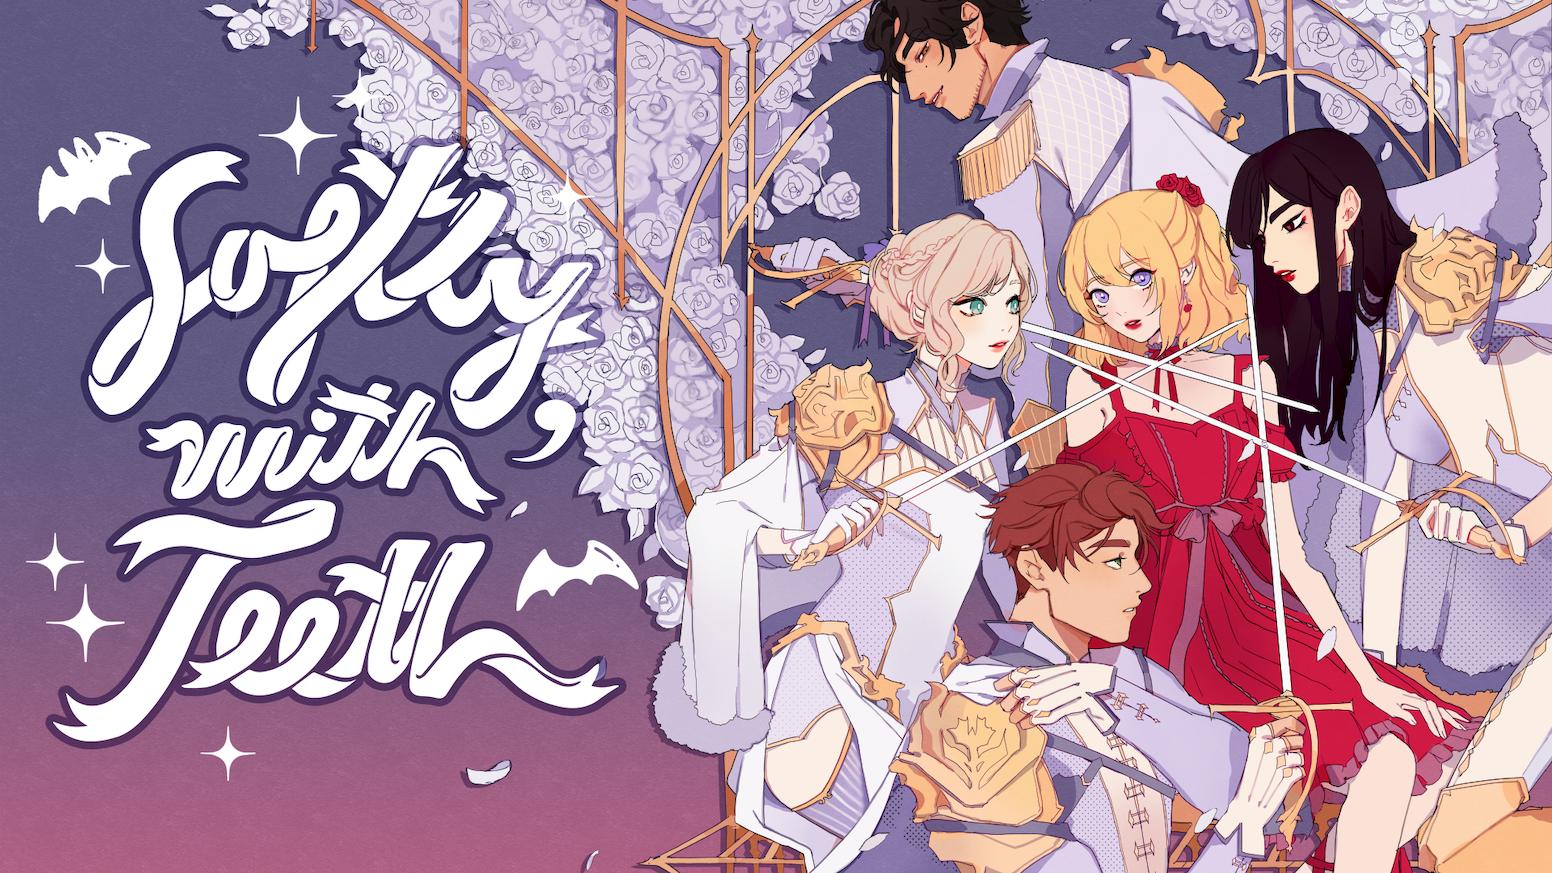 Softly, With Teeth: A Vampire Otome + Yuri Visual Novel by